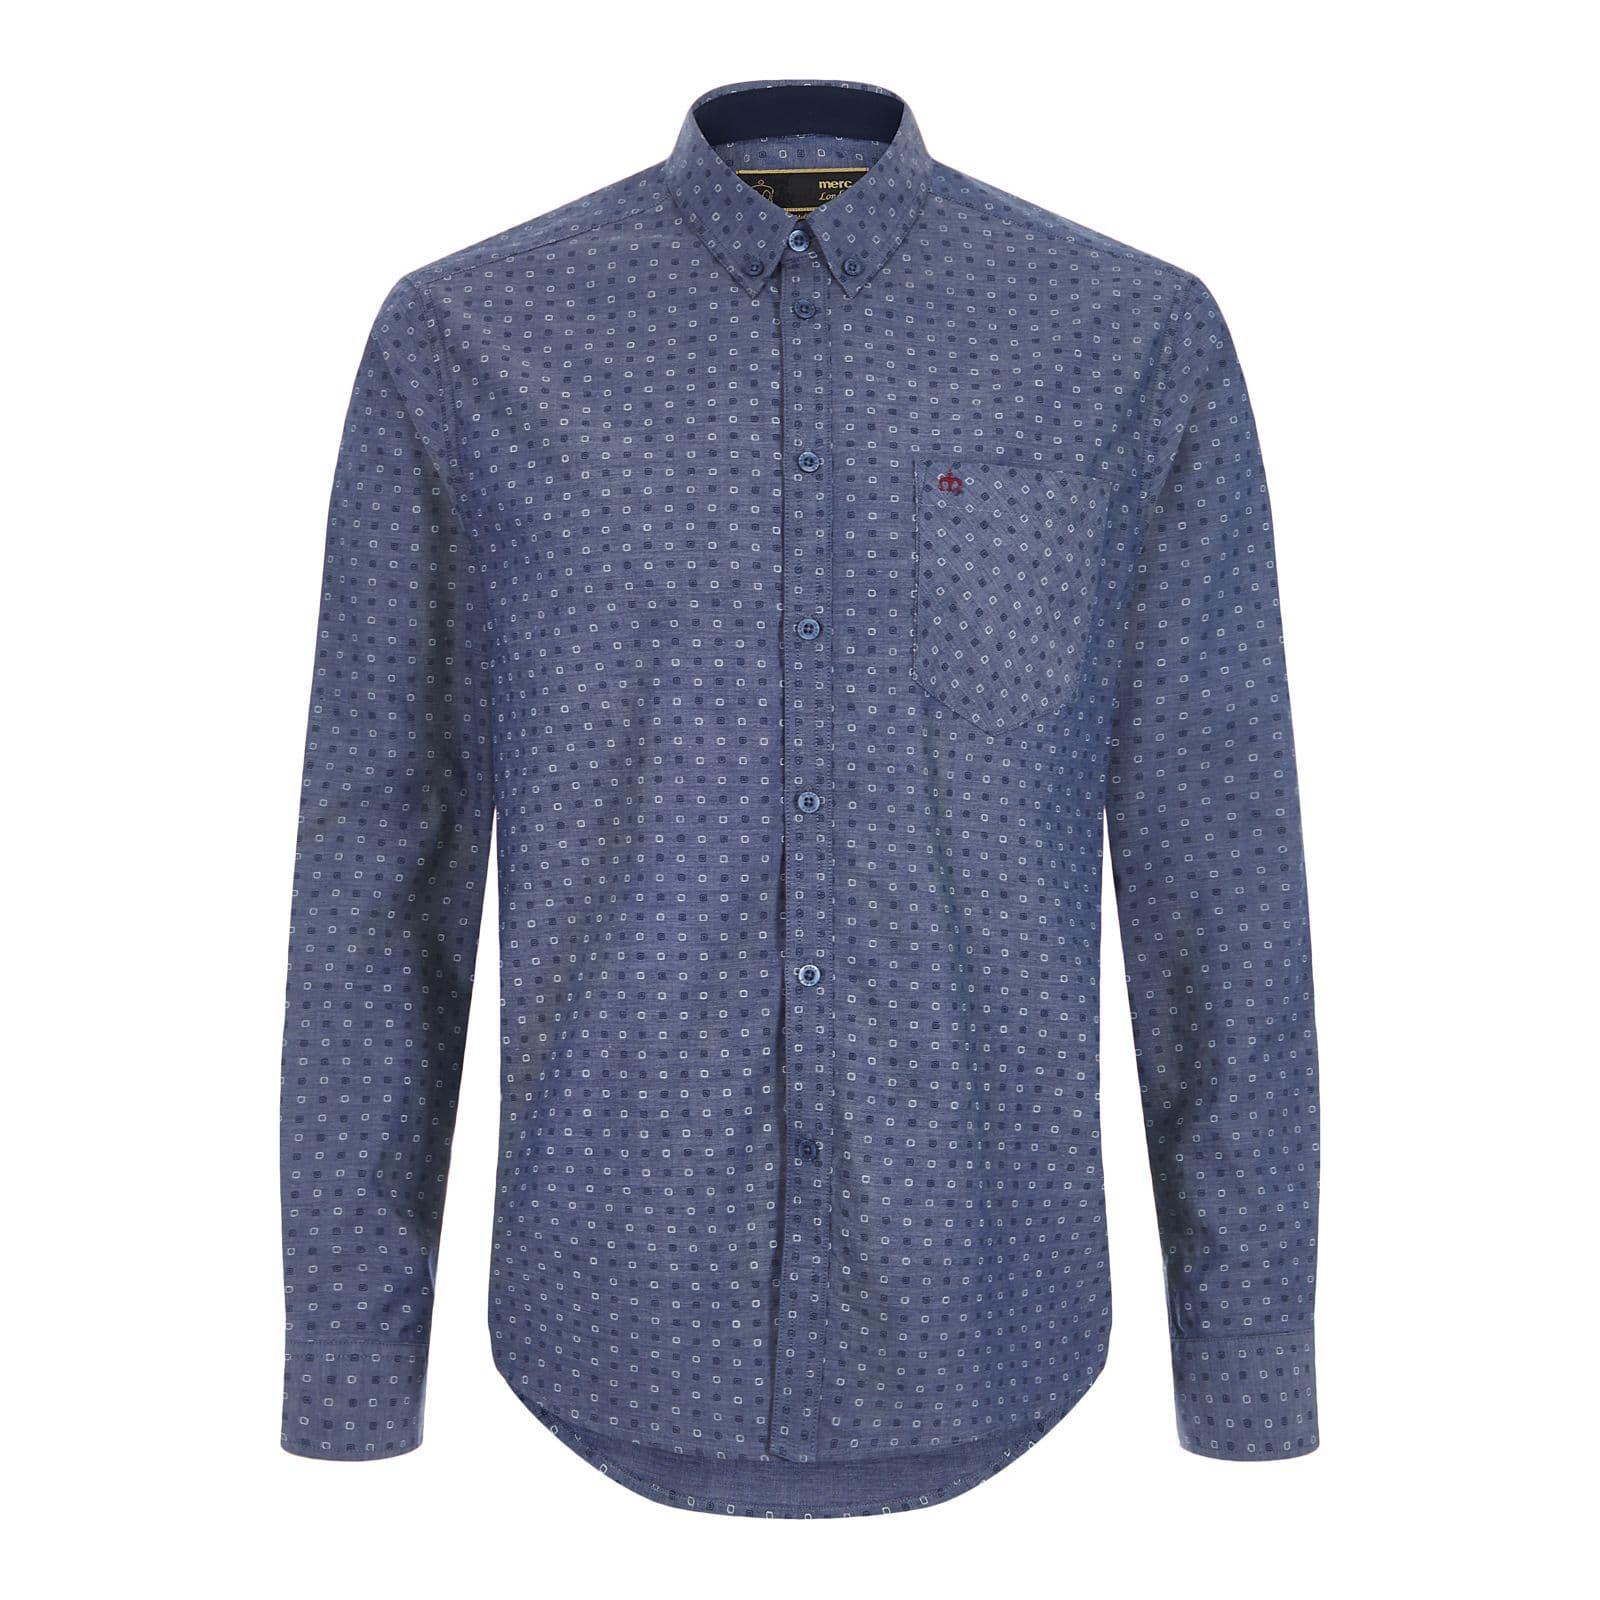 Рубашка NewarkРубашки под заказ<br><br><br>Артикул: 1517108<br>Материал: 100% хлопок<br>Цвет: синевато-серый<br>Пол: Мужской